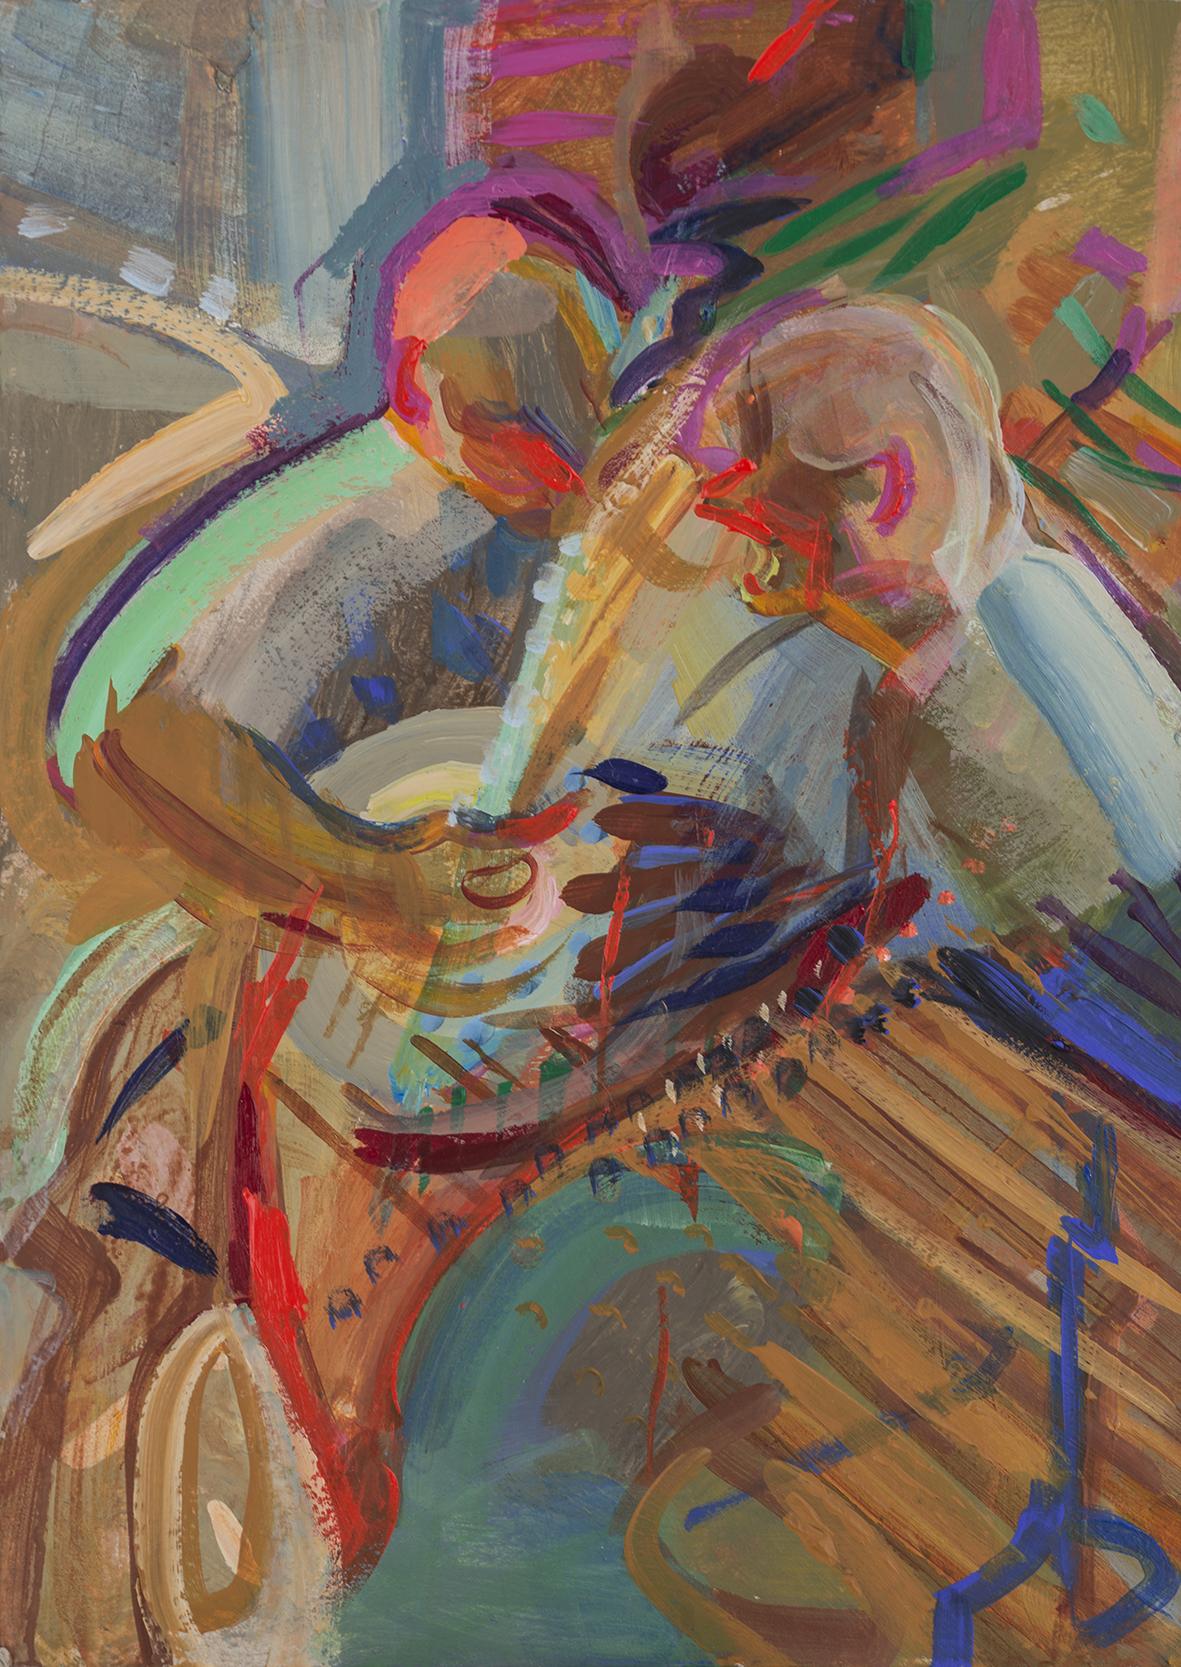 'Bluebell Polka' banjo and dulcimers